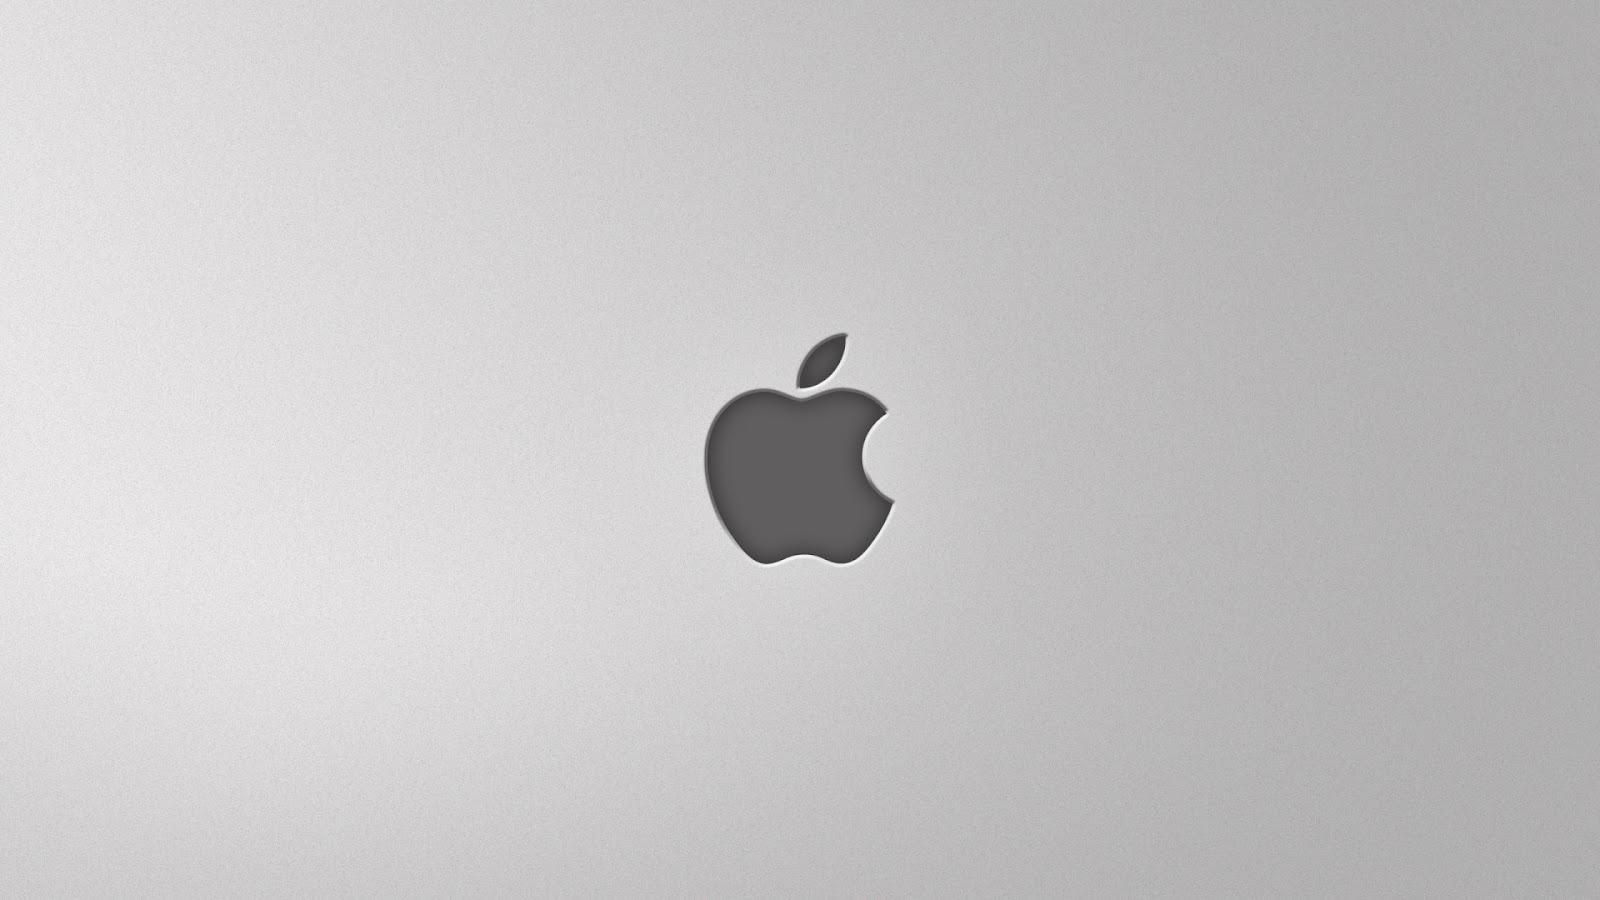 Simple Wallpaper Macbook Minimalist - Minimal_Apple_Logo_Grey_HD_Desktop_Wallpaper  Snapshot_264991.jpg